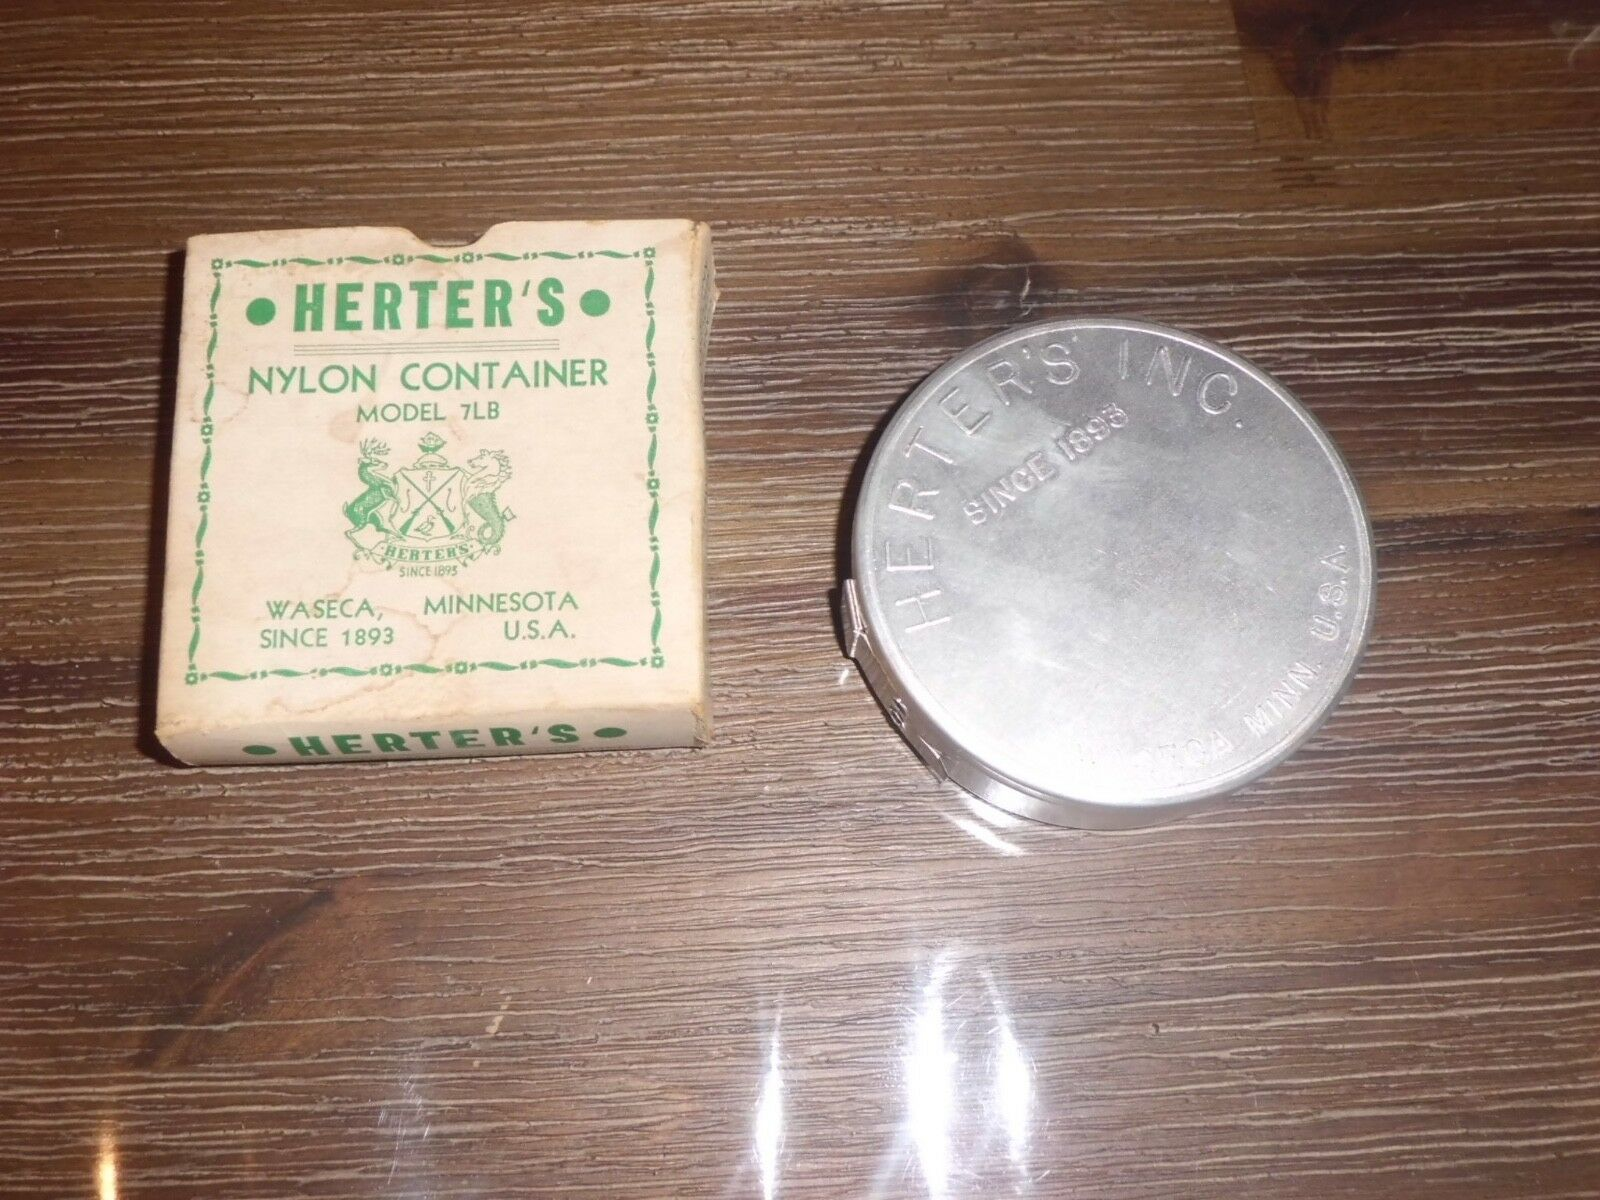 NOS Vintage Herter's Aluminum Model 7LB Nylon Leader Container made in USA